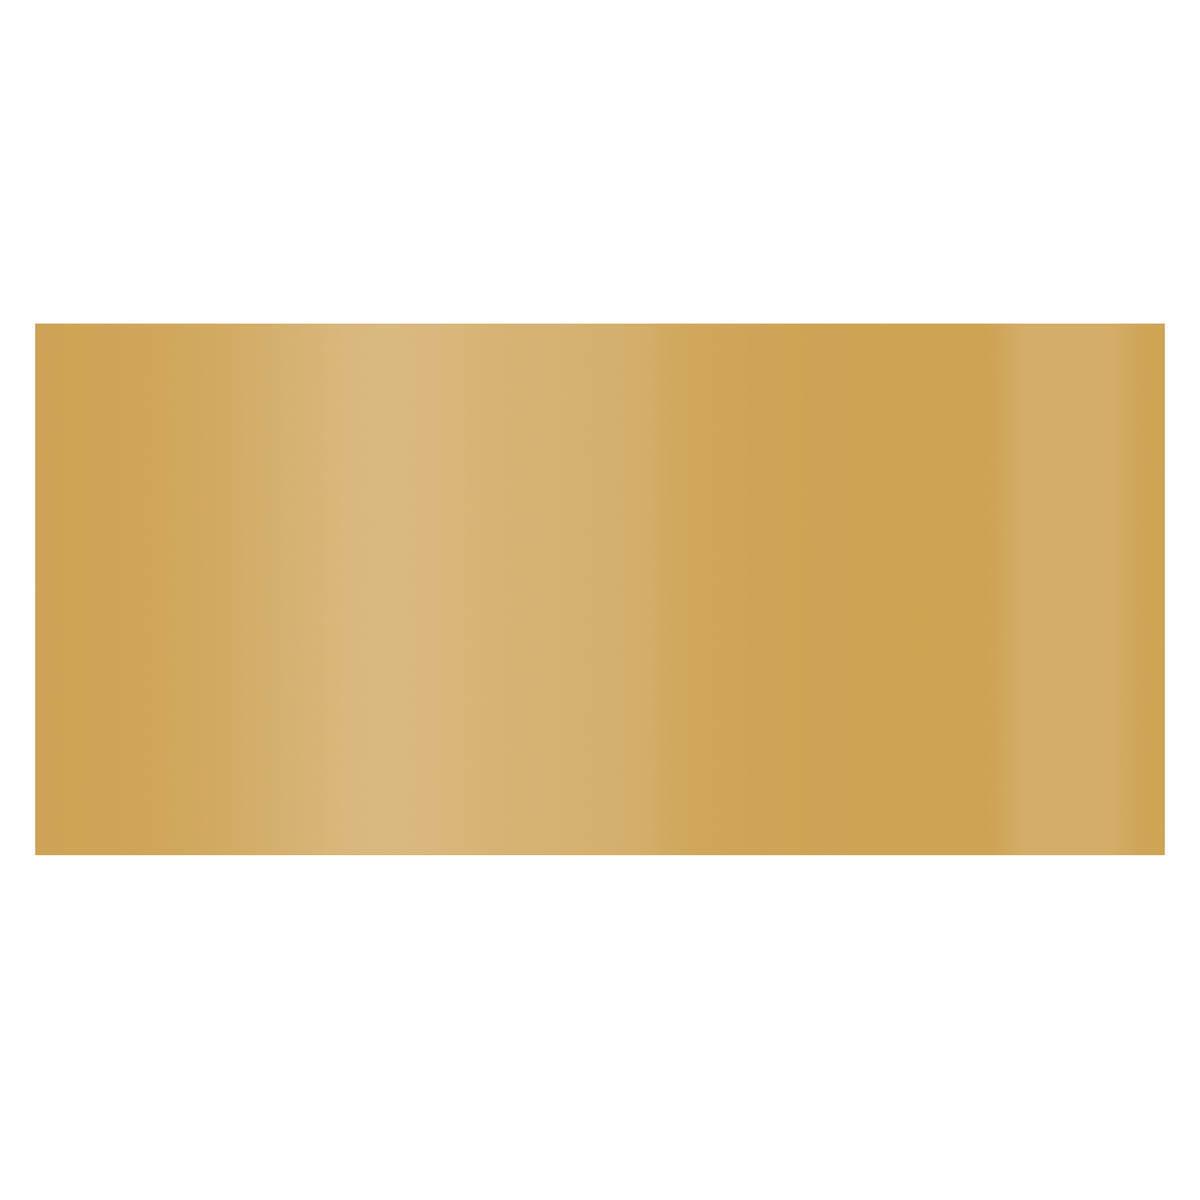 Waverly ® Inspirations Metallic Multi-Surface Acrylic Paint - Sunstone, 2 oz.